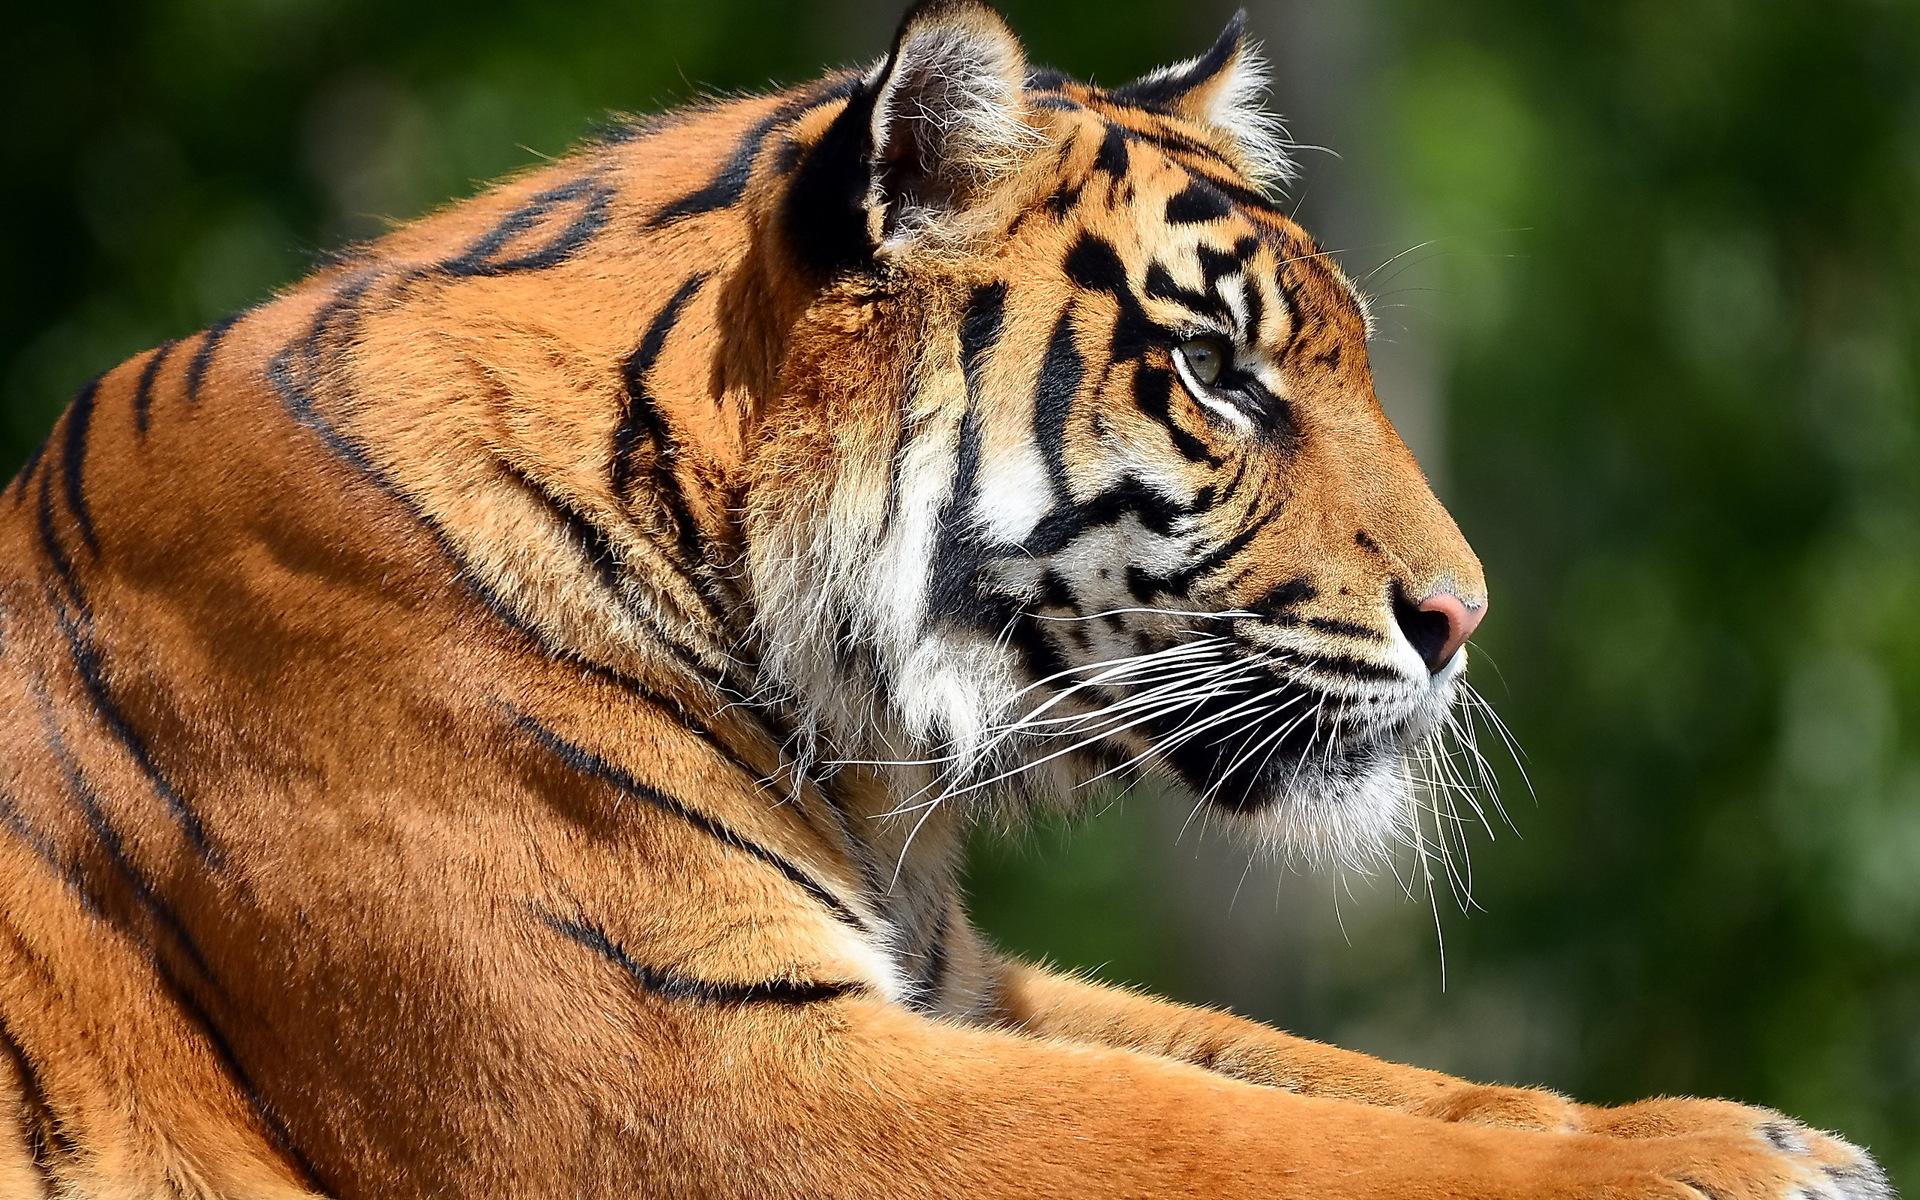 wallpaper tigers